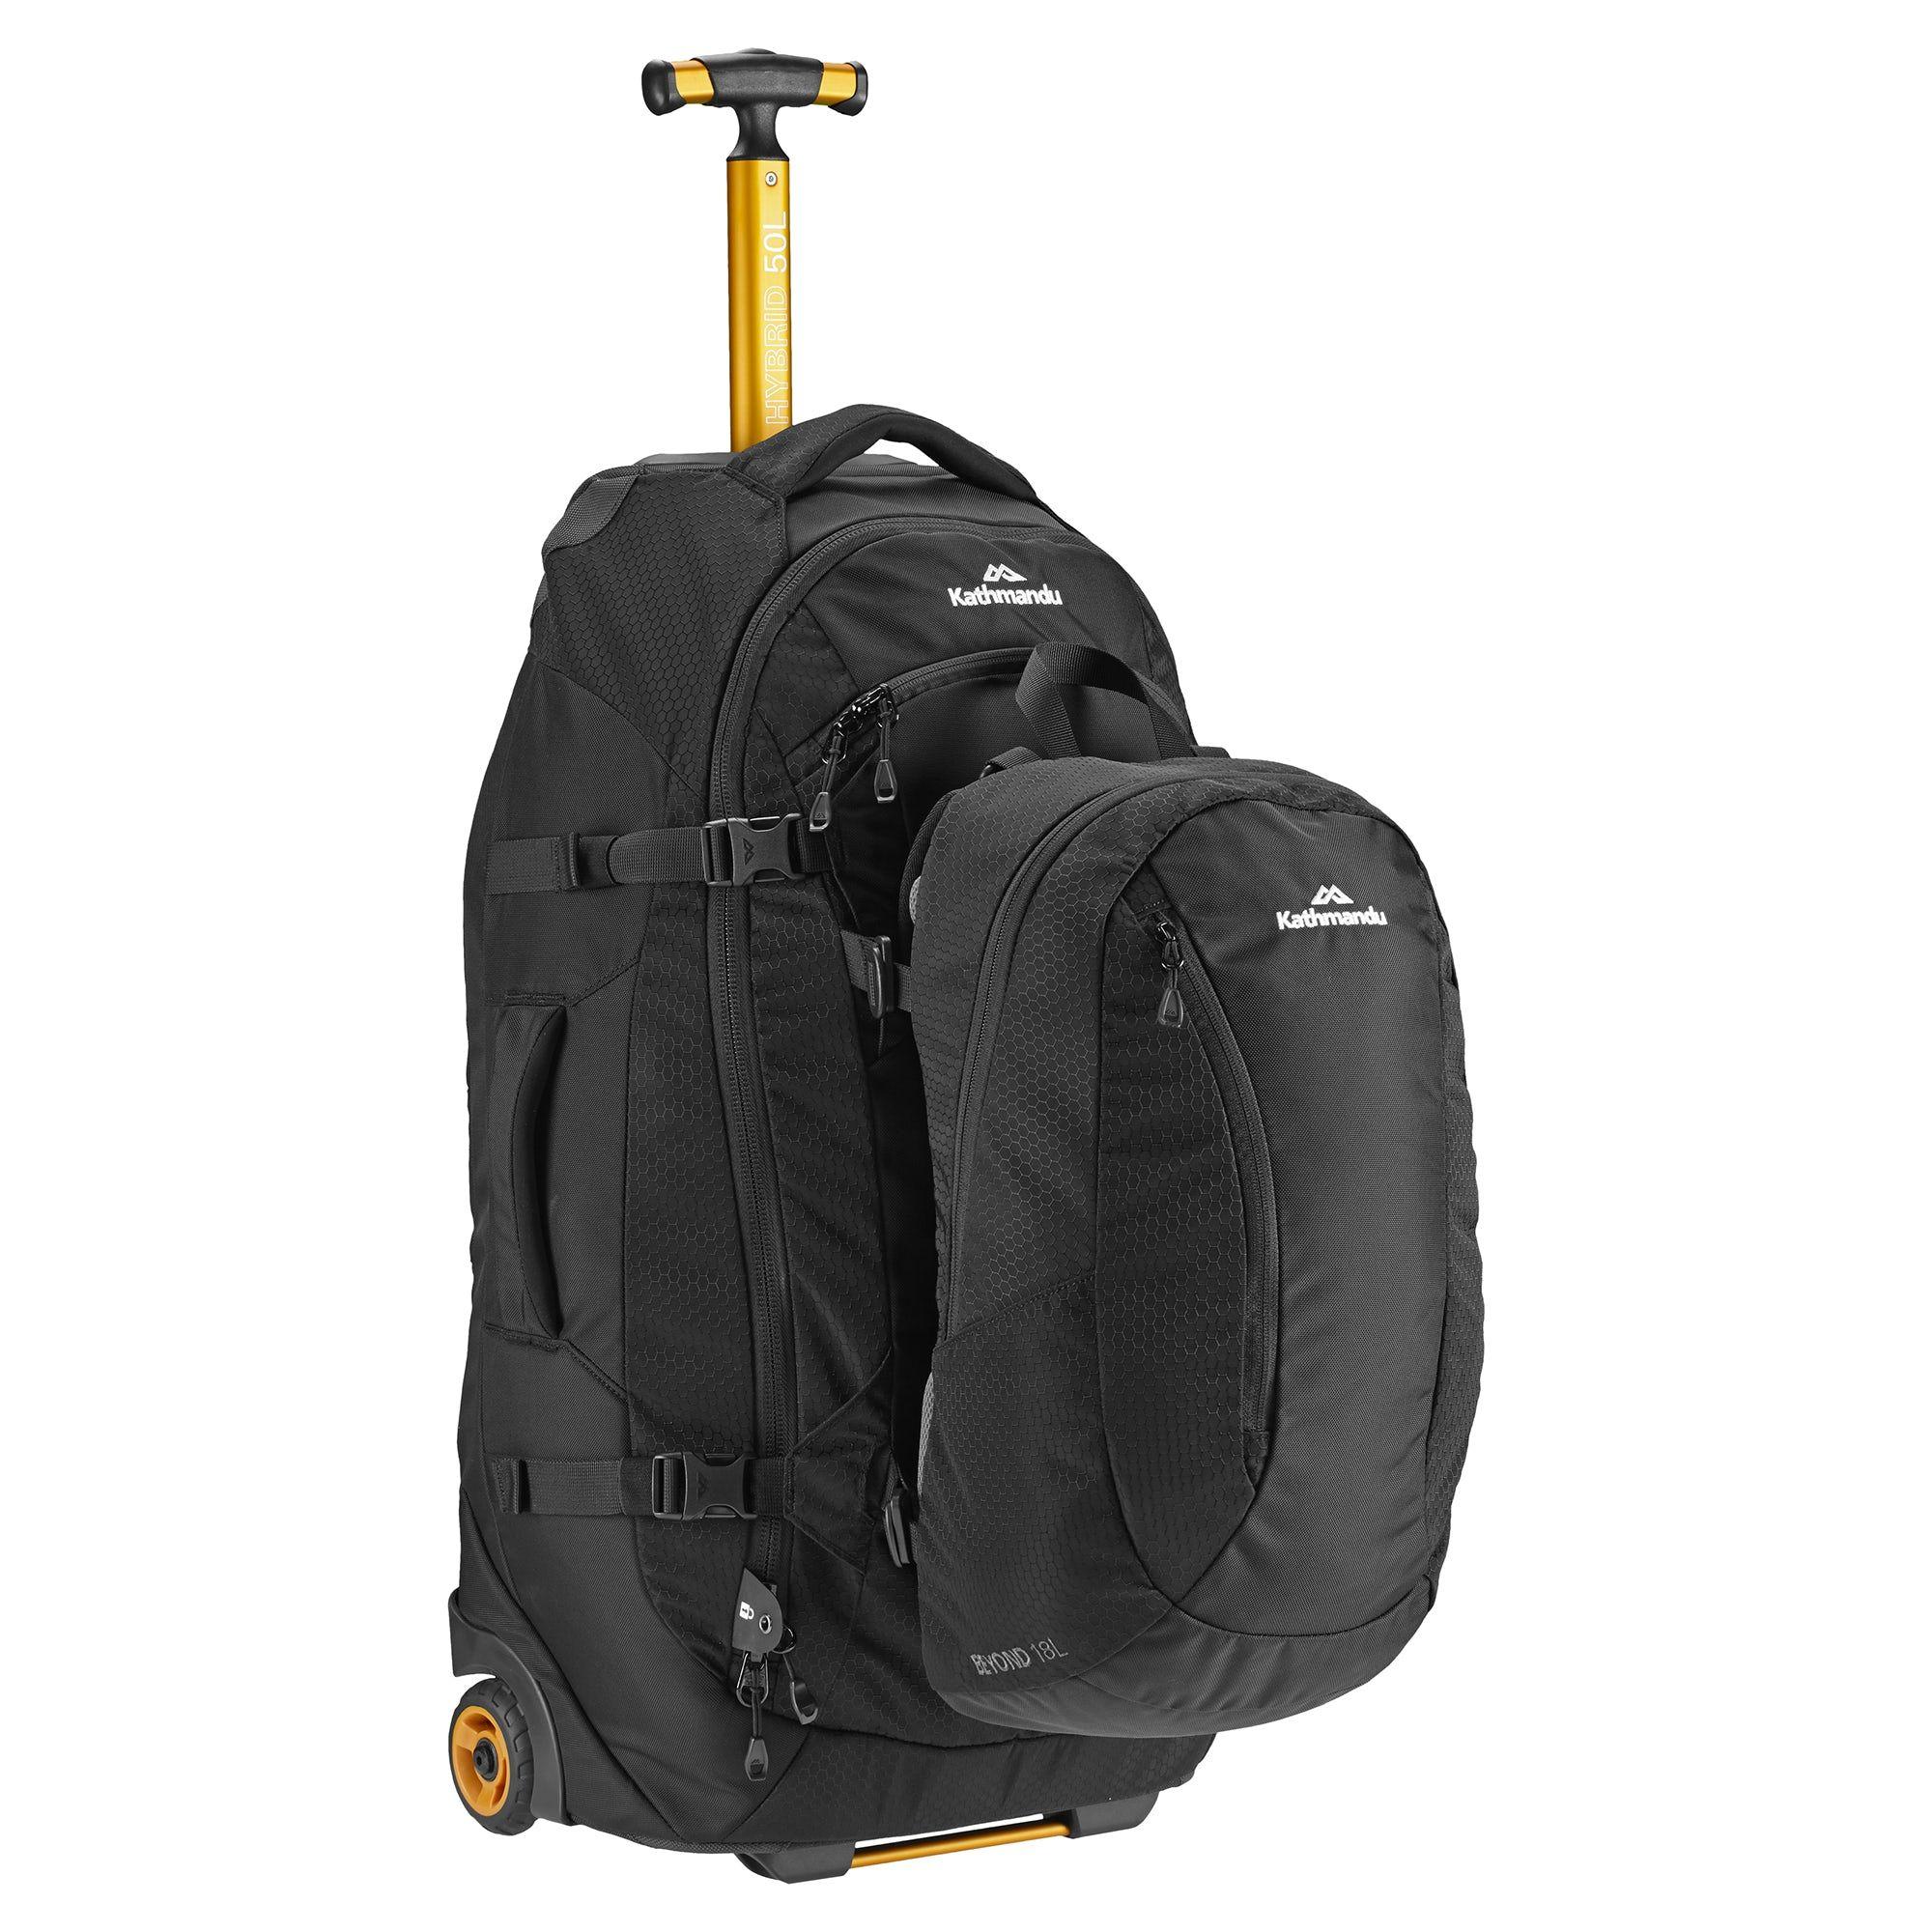 7de82ba5b Kathmandu-Hybrid-50L-Backpack-Harness-Wheeled-Travel-Luggage-Trolley-Bag -v3-NEW